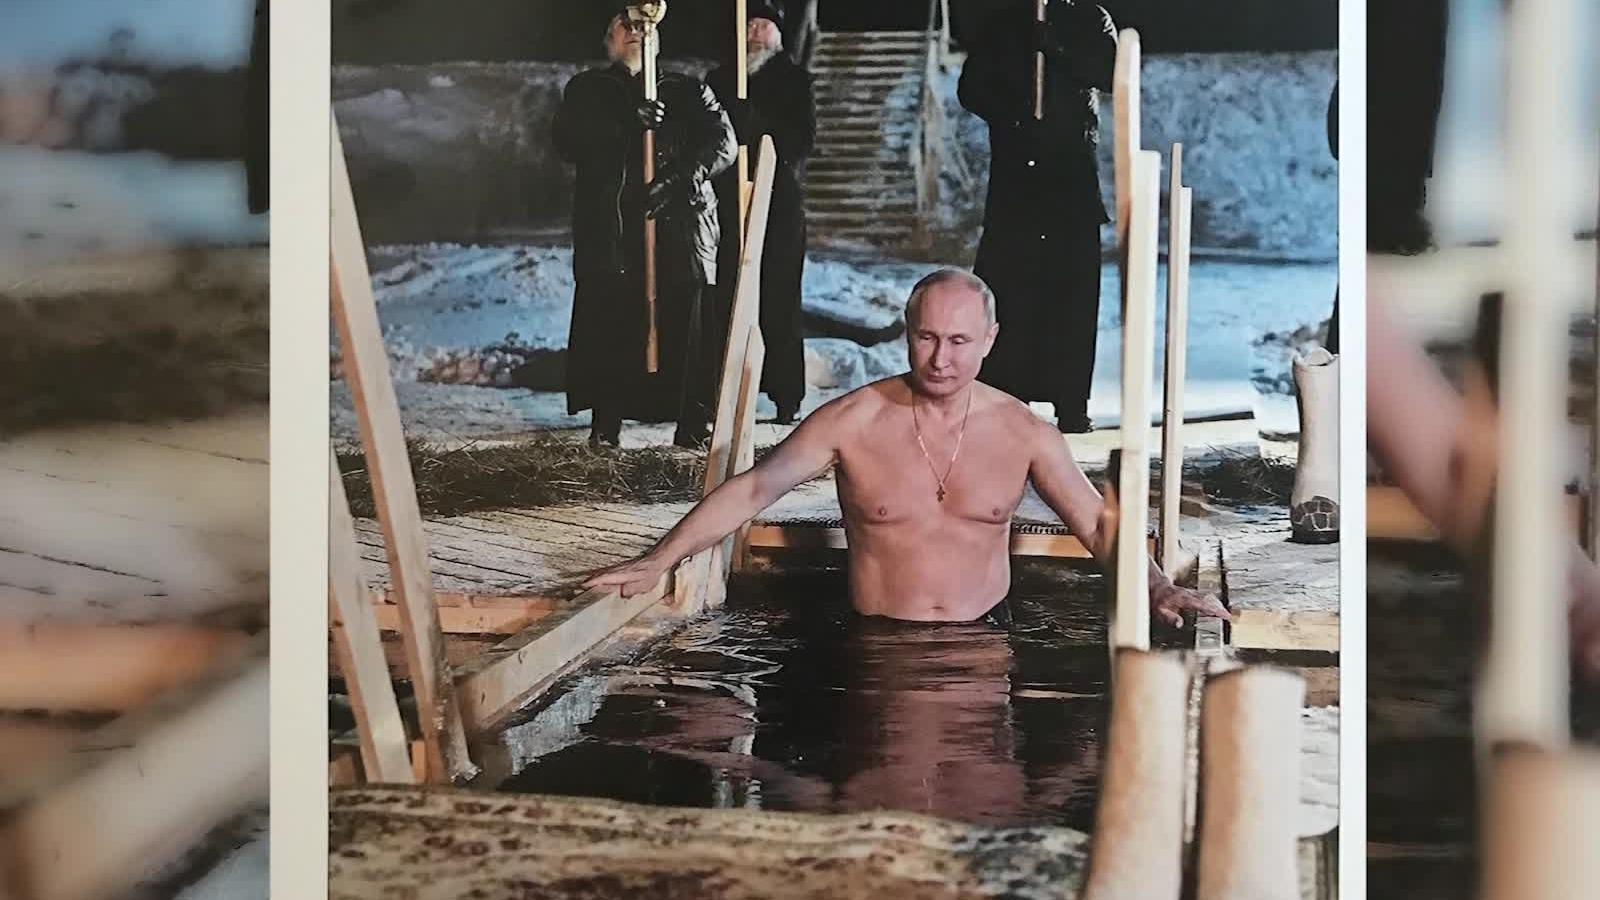 Vladimir Putin Plays Hockey And Cuddles A Puppy In New 2019 Calendars Cnn